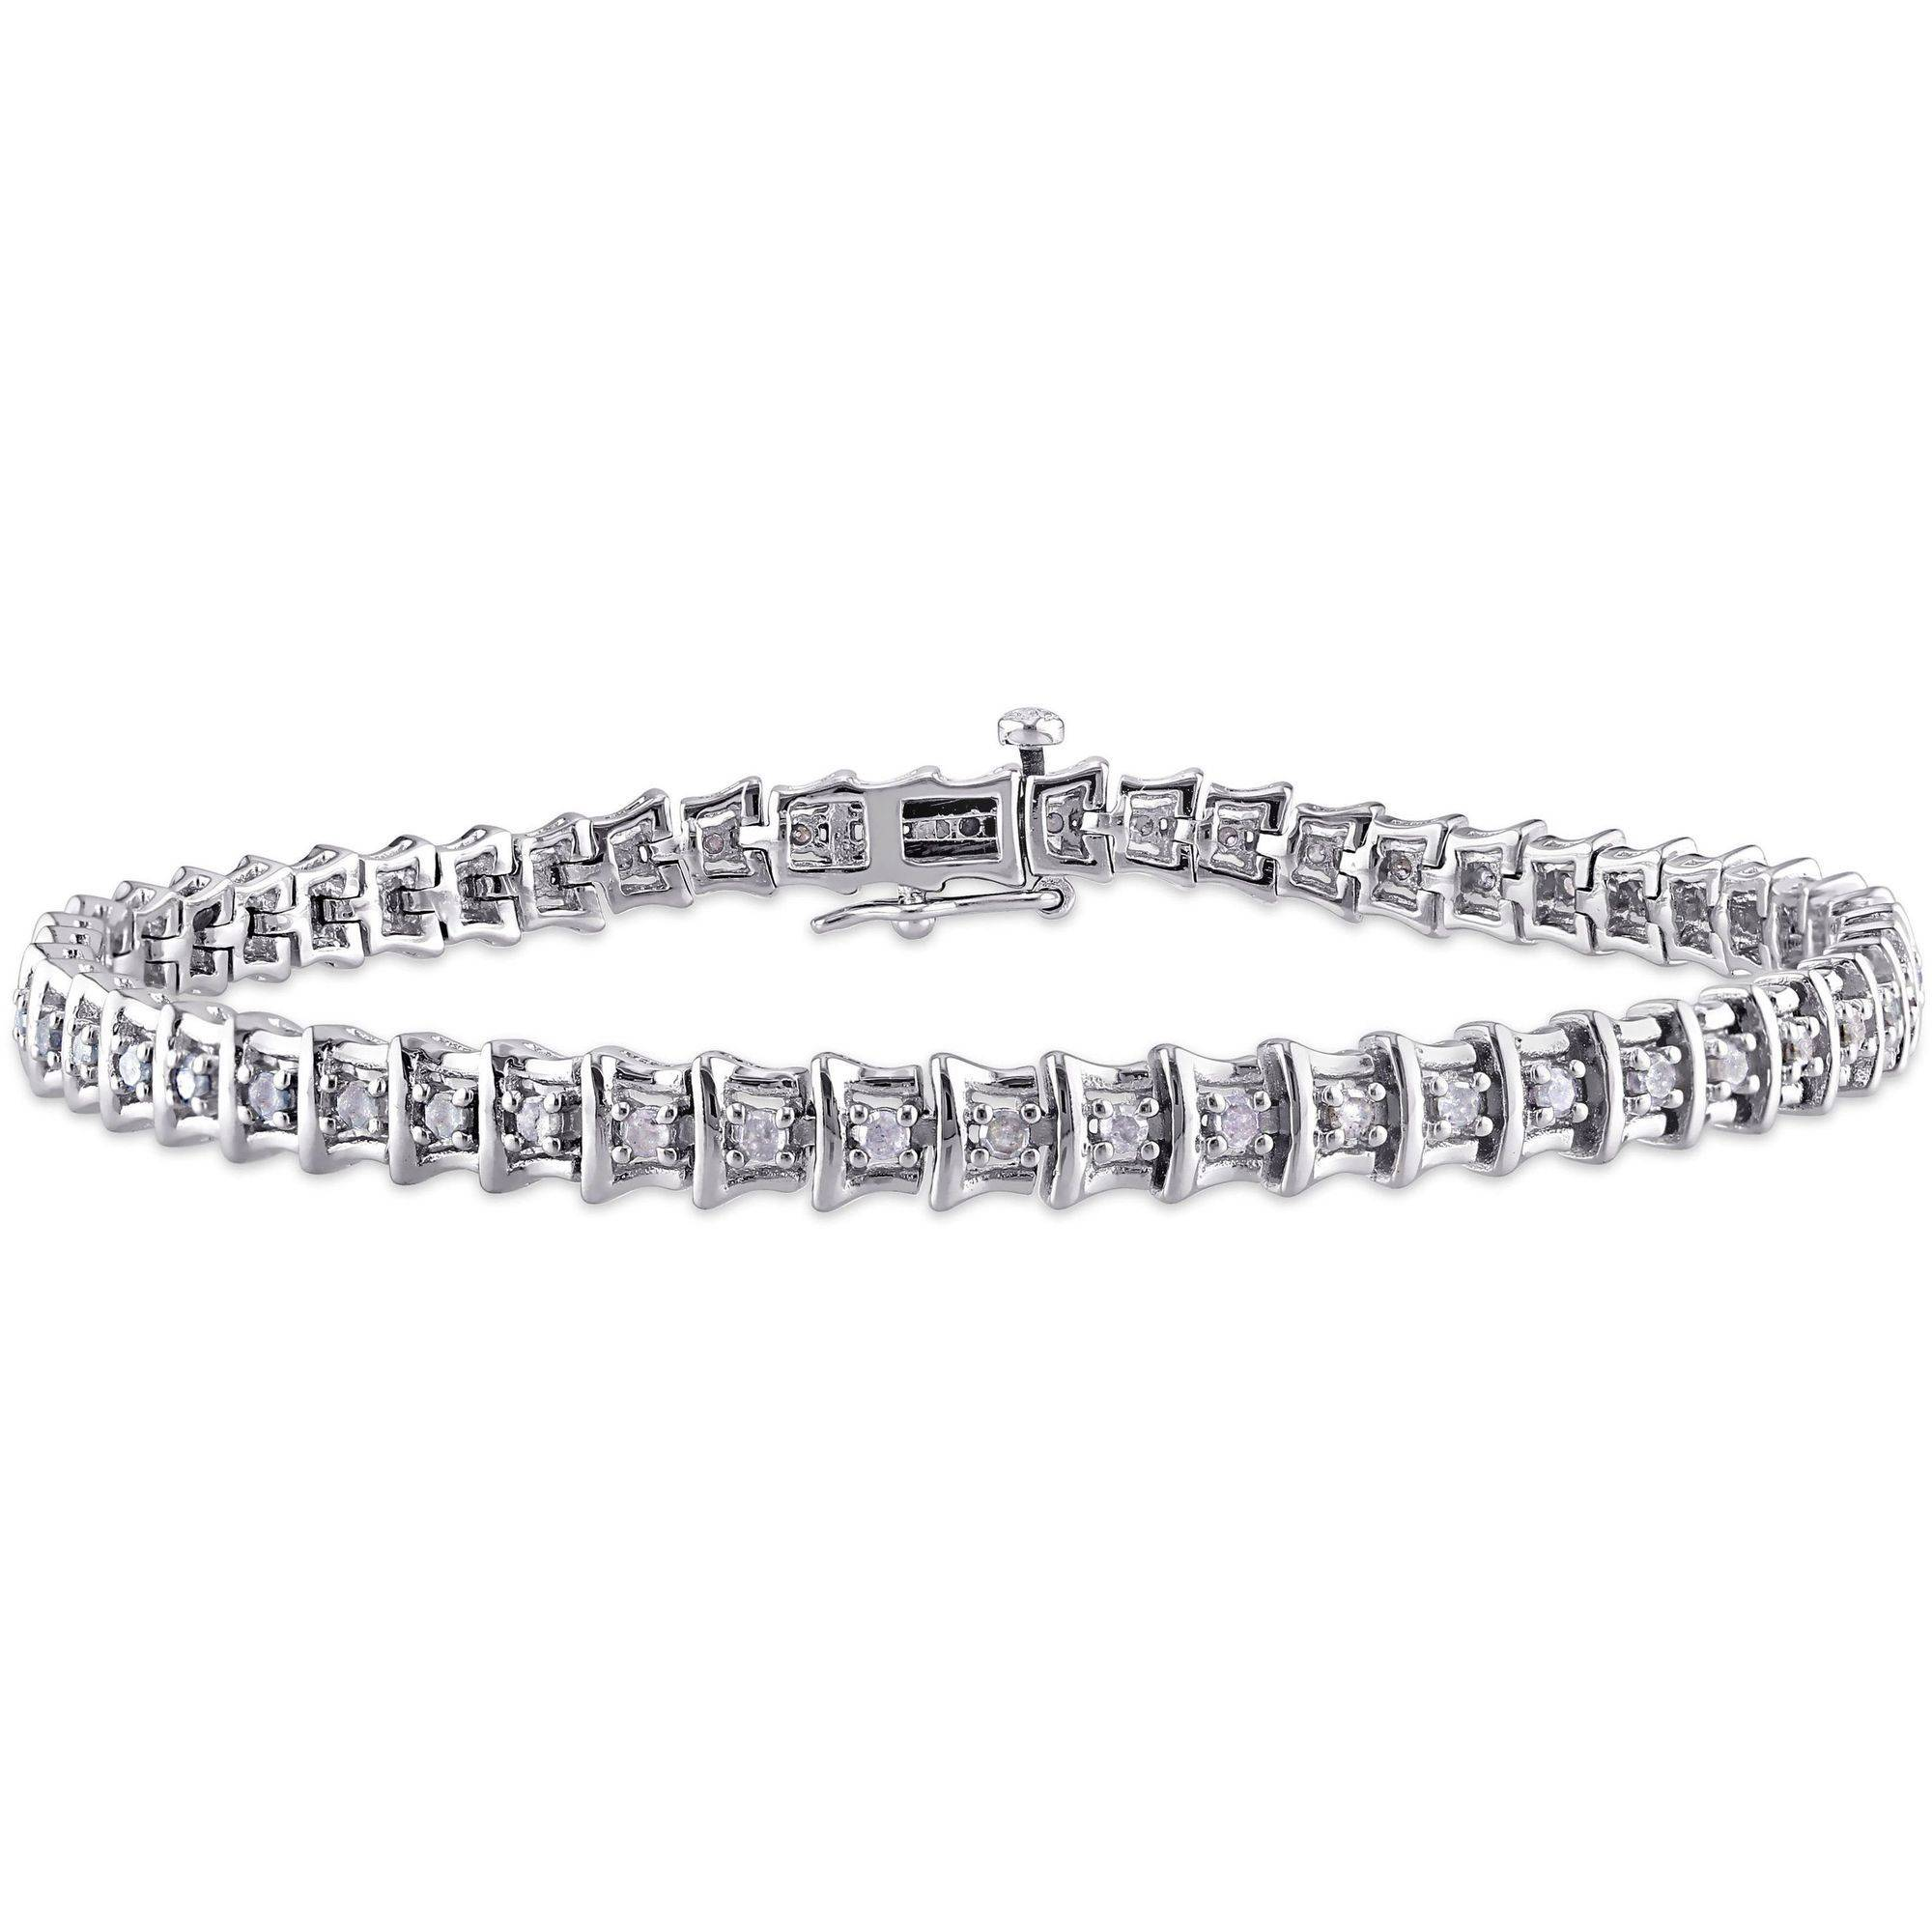 "Miabella 1 Carat T.W. Diamond Sterling Silver Tennis Bracelet, 7.25"" by Miabella"